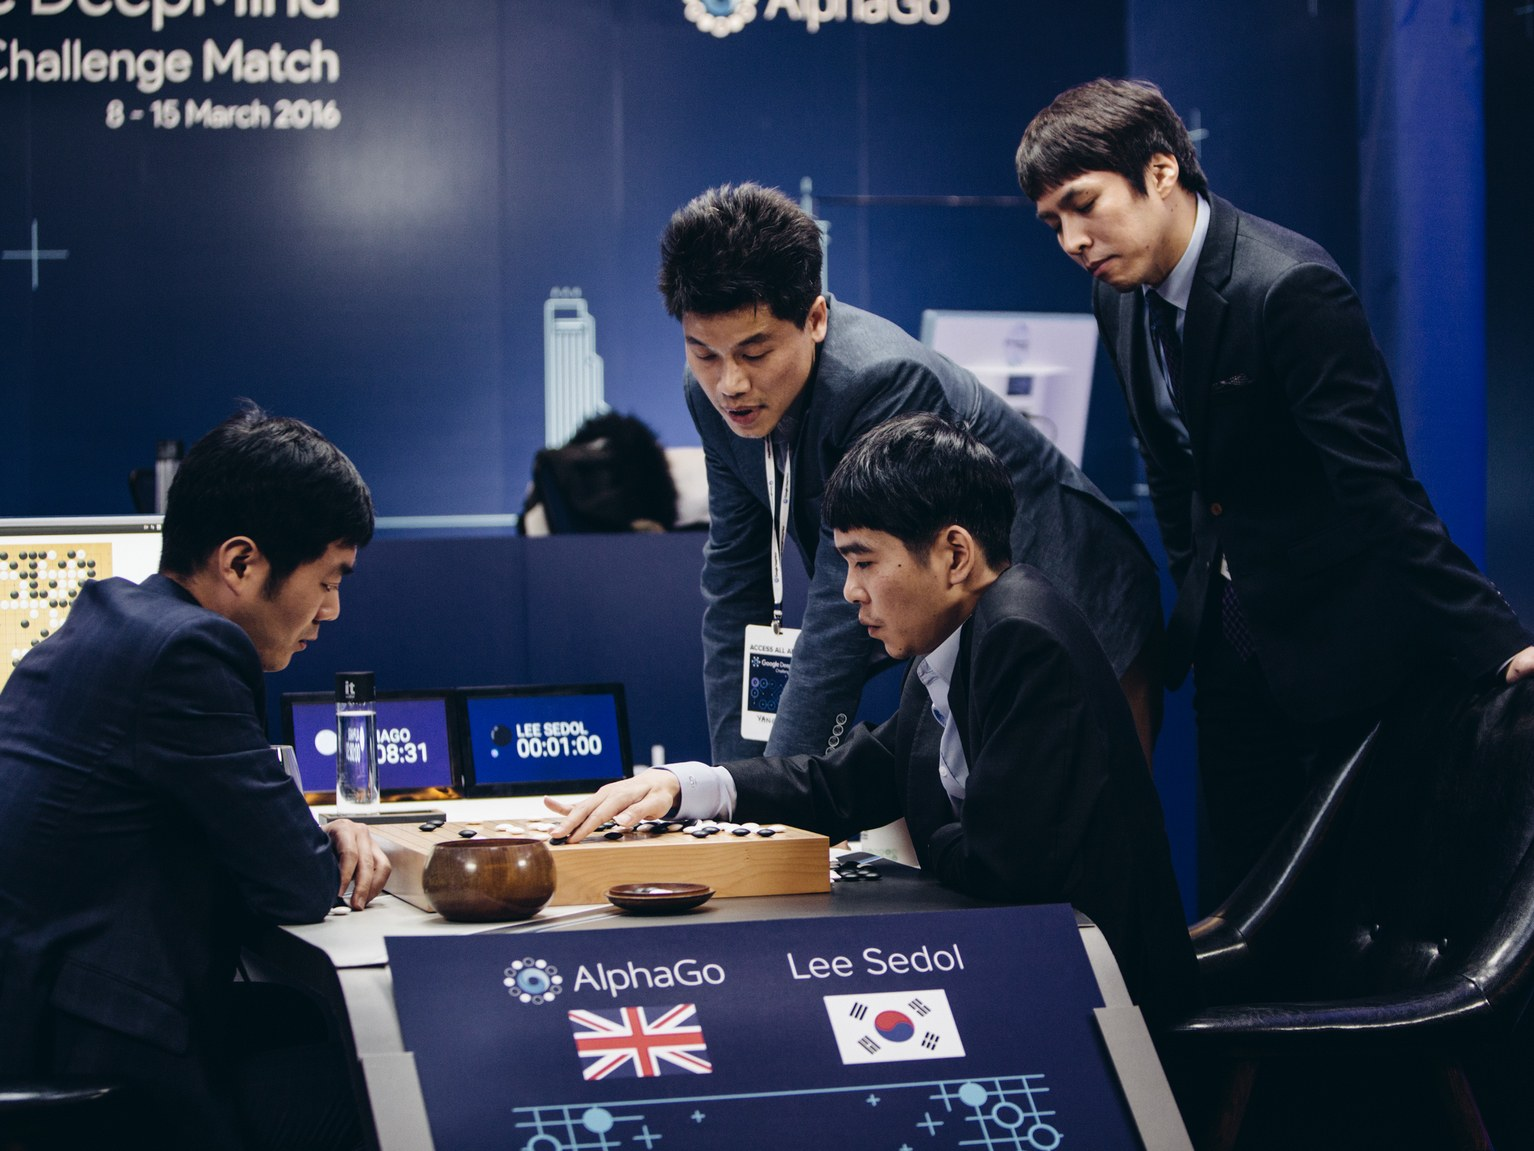 AlphaGo - Lee Sedol karşılaşması